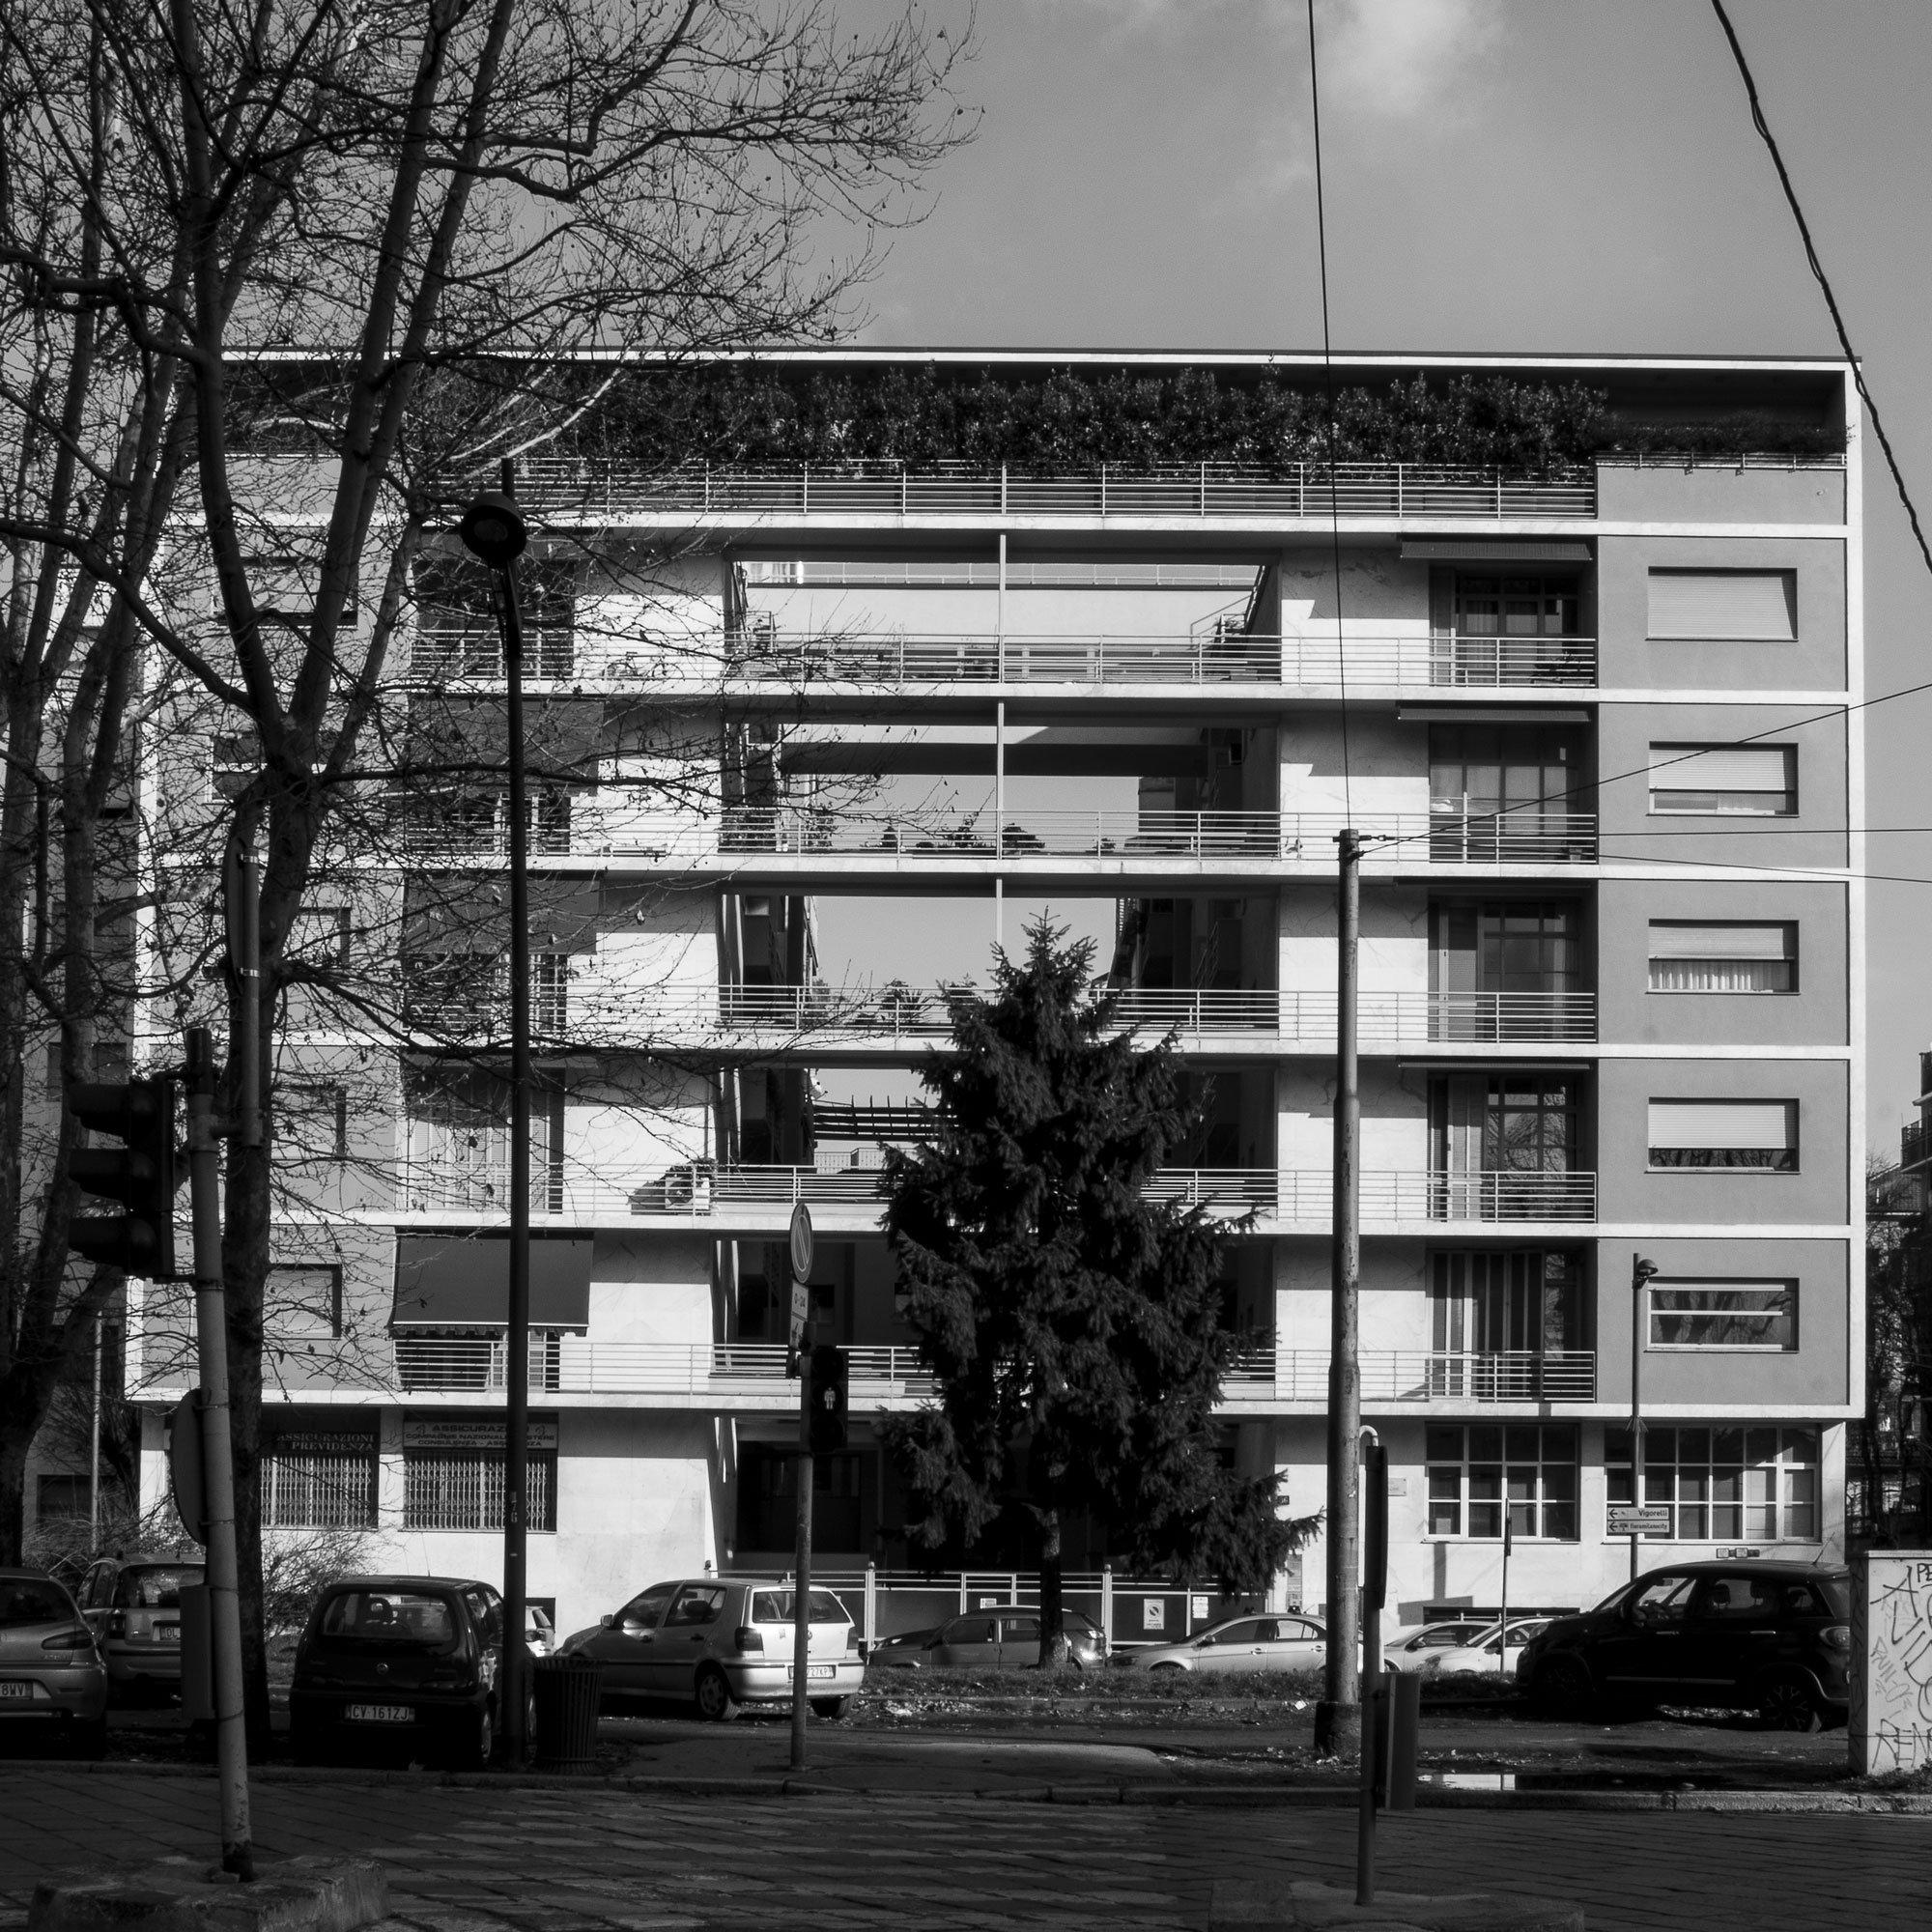 Aldo Rossi, Unità residenziale al Gallaratese, Milano (1968-1973) © Daniele Zerbi